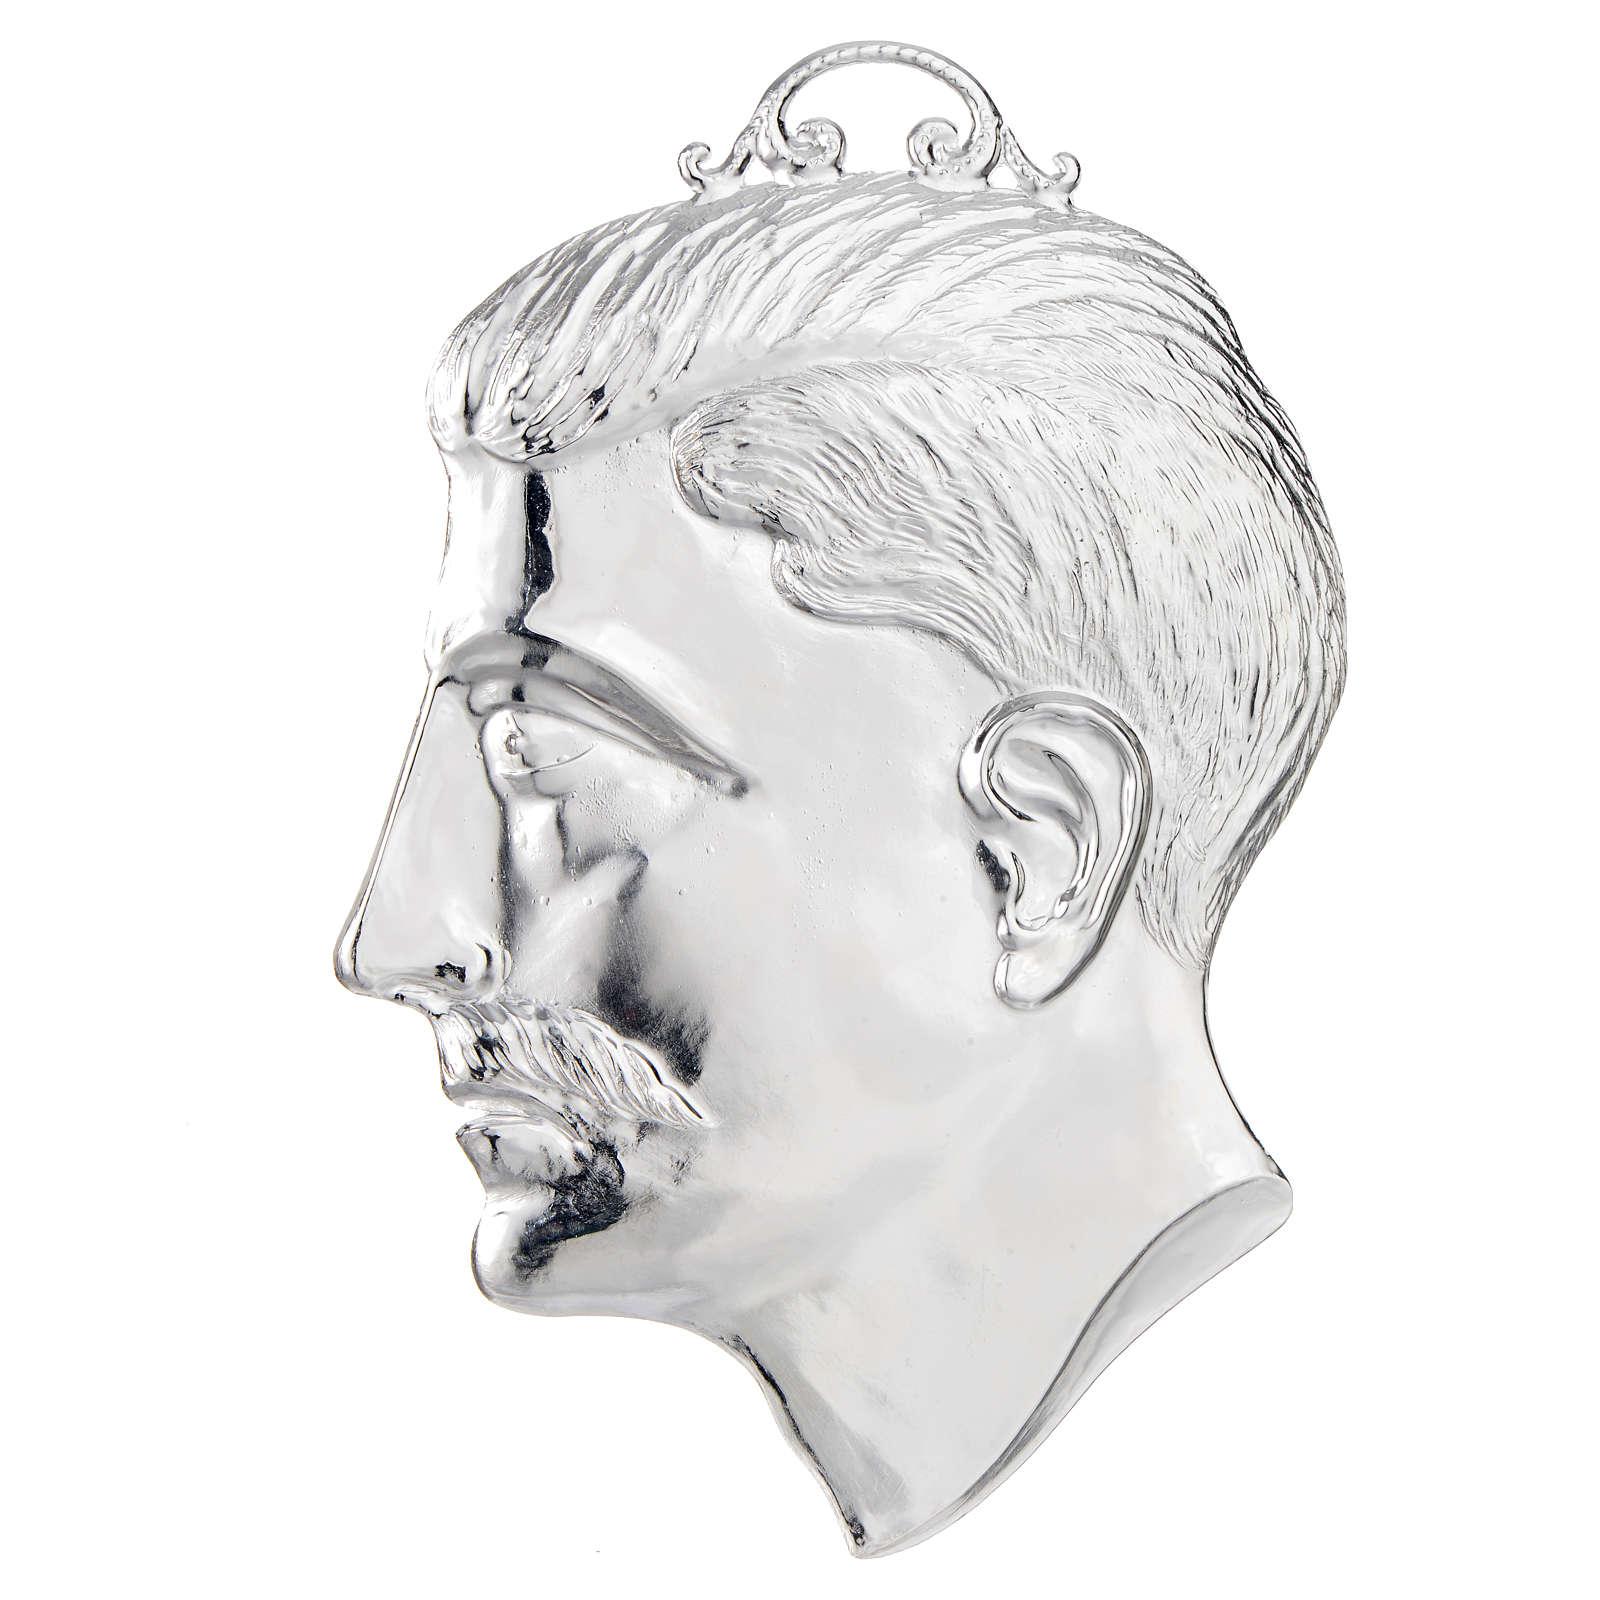 Ex voto testa di uomo argento 925 o metallo 15 cm 3